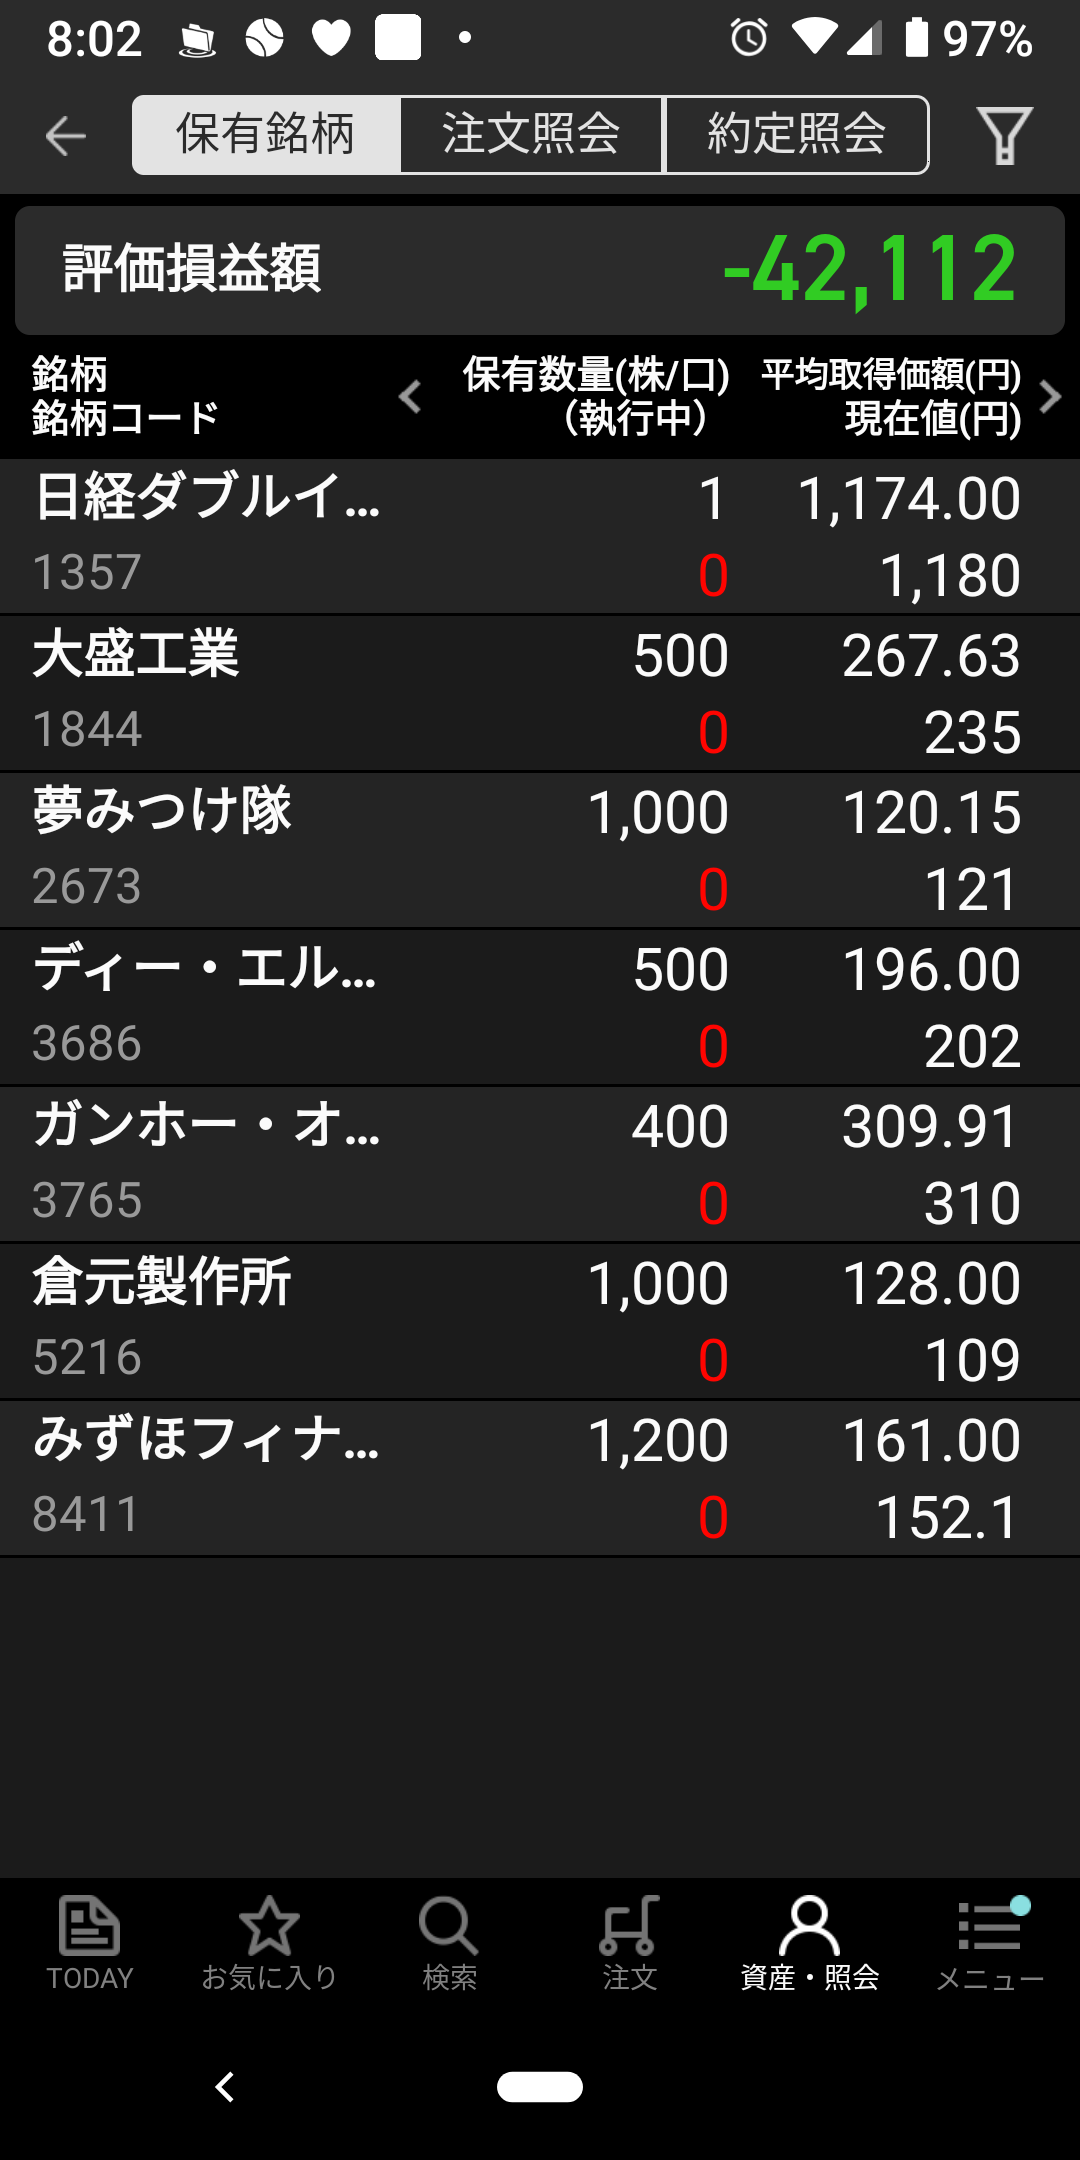 Screenshot (2019_06_15 8_02_46)